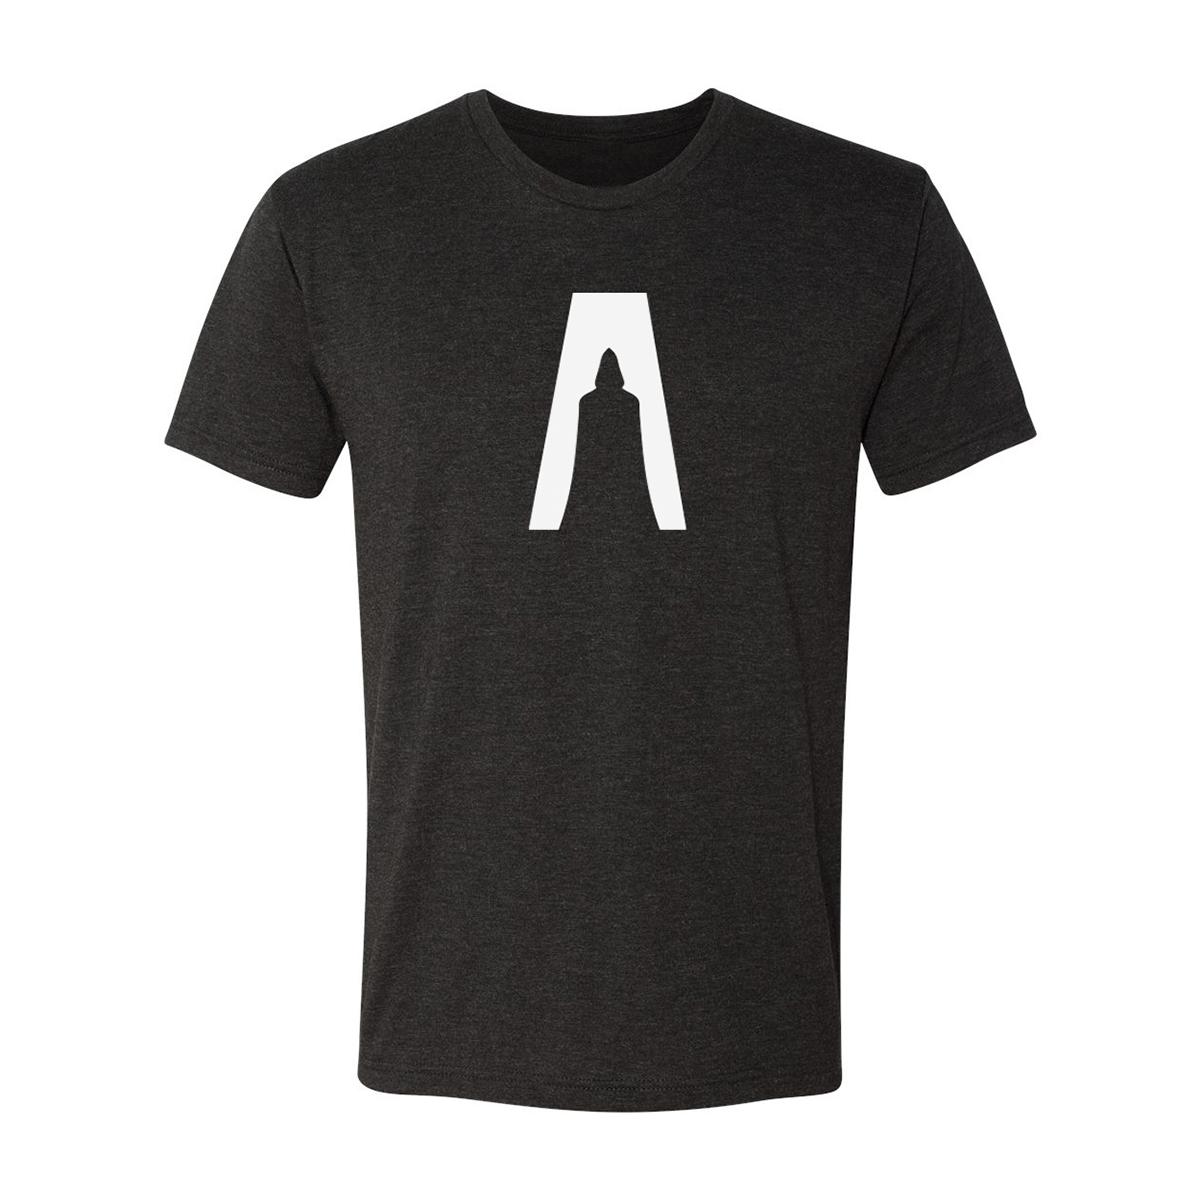 Marvel's Cloak & Dagger Cloak Icon T-Shirt